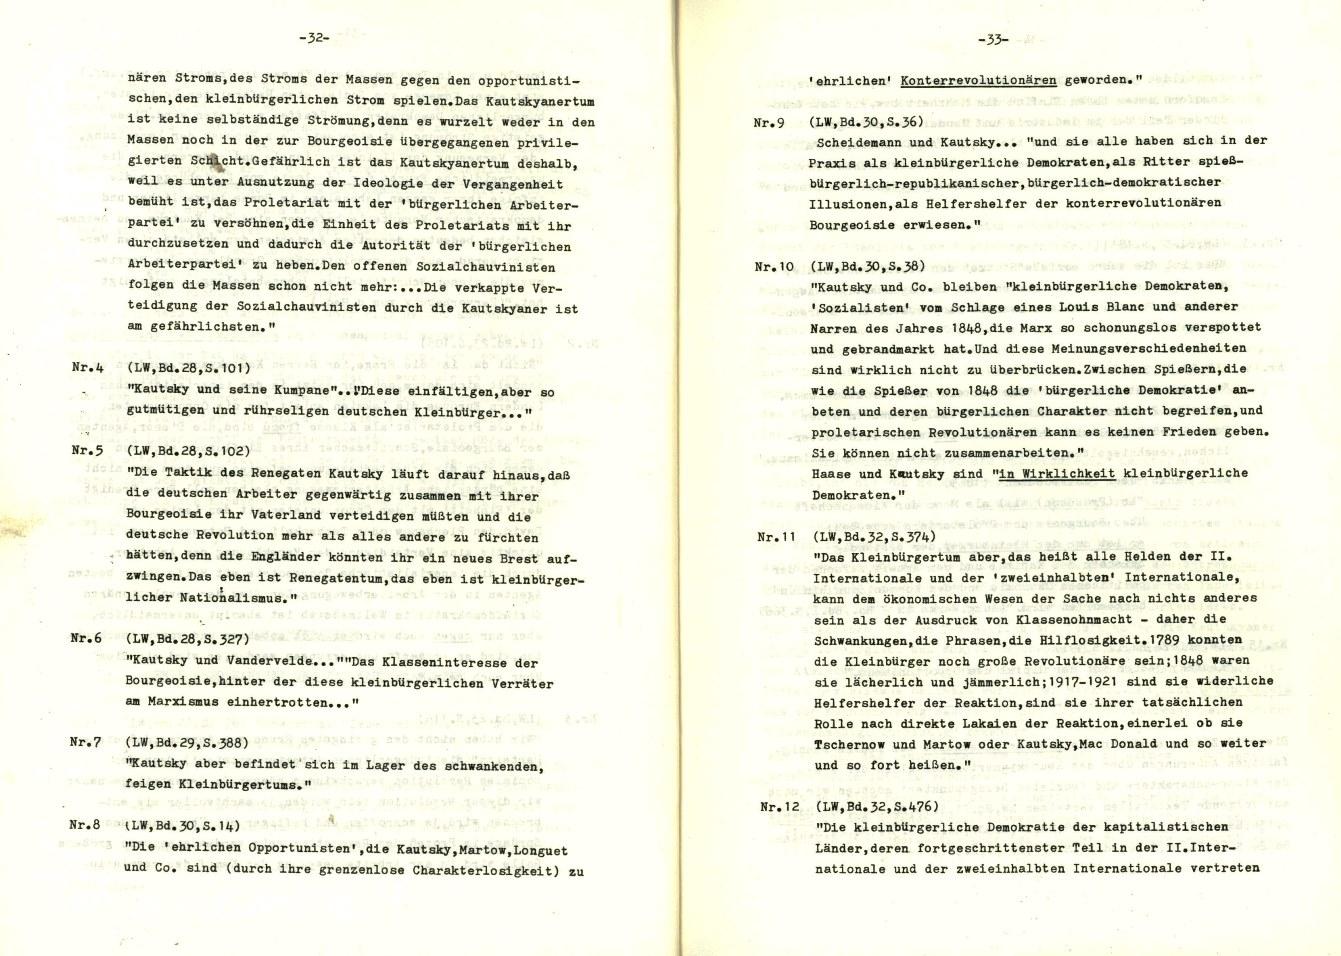 Muenchen_Kampf_dem_Revisionismus_1979_09_17